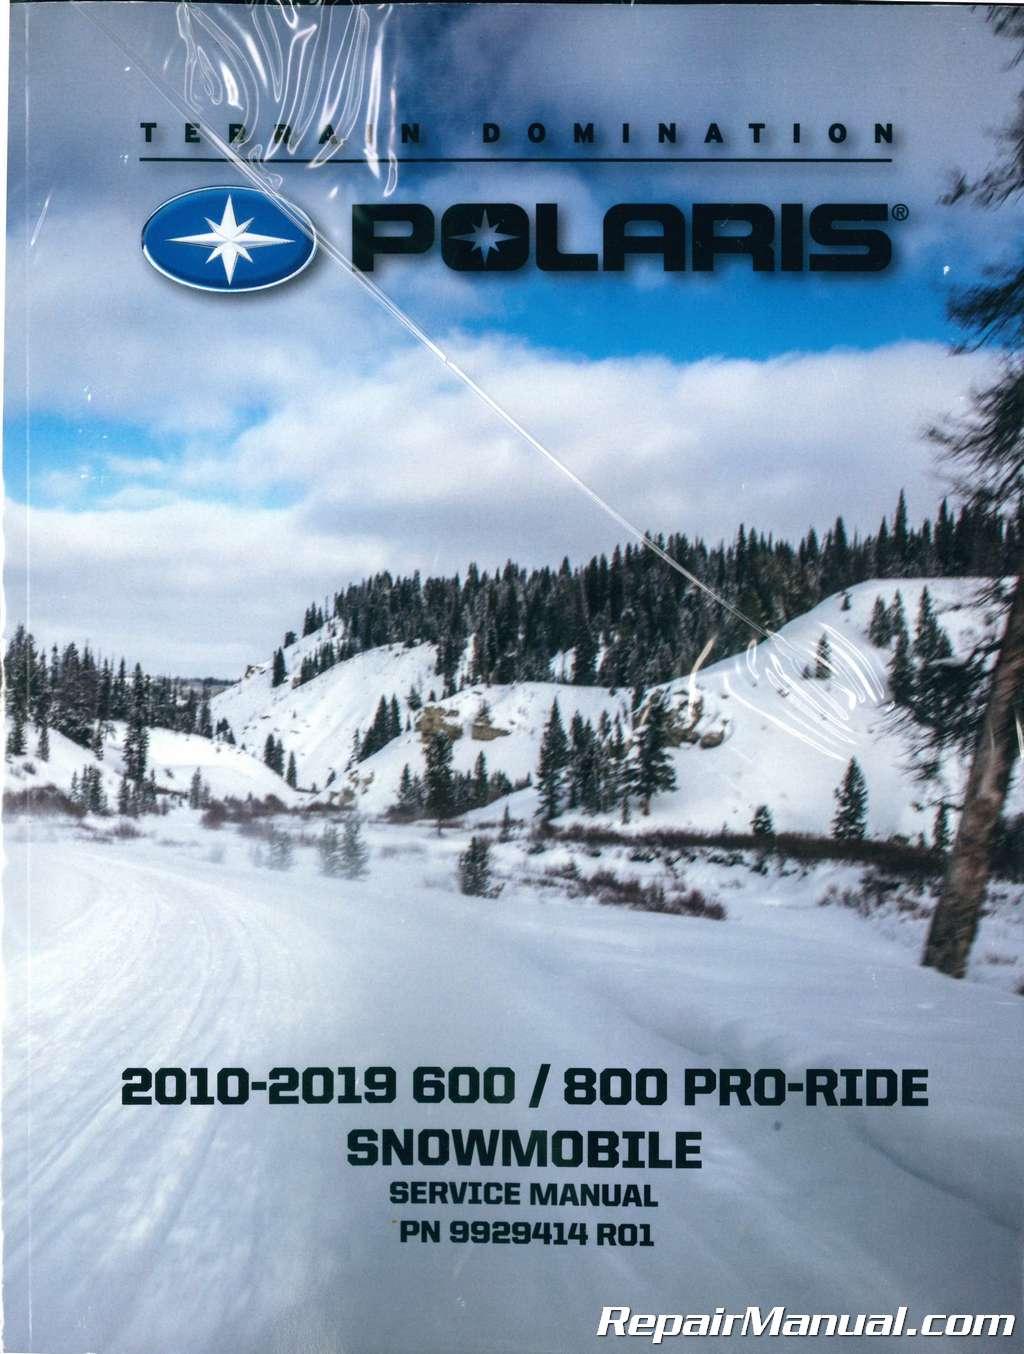 hight resolution of 2010 2019 polaris pro ride 600 800 snowmobile service manual2010 polaris lx 600 wiring diagram